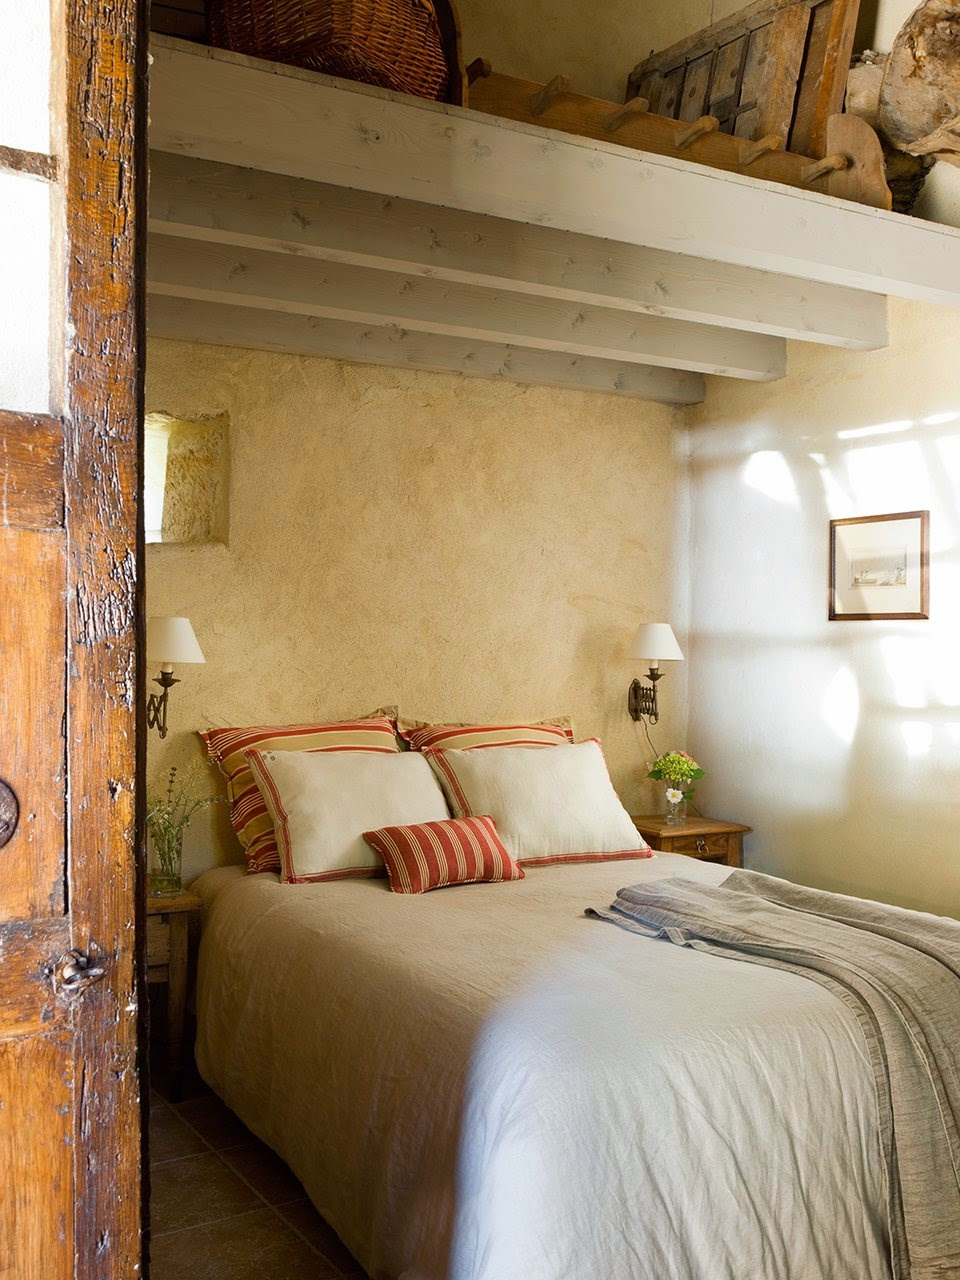 amenajari, interioare, decoratiuni, decor, design interior, stil rustic, reconversie, zid de piatra, dormitor